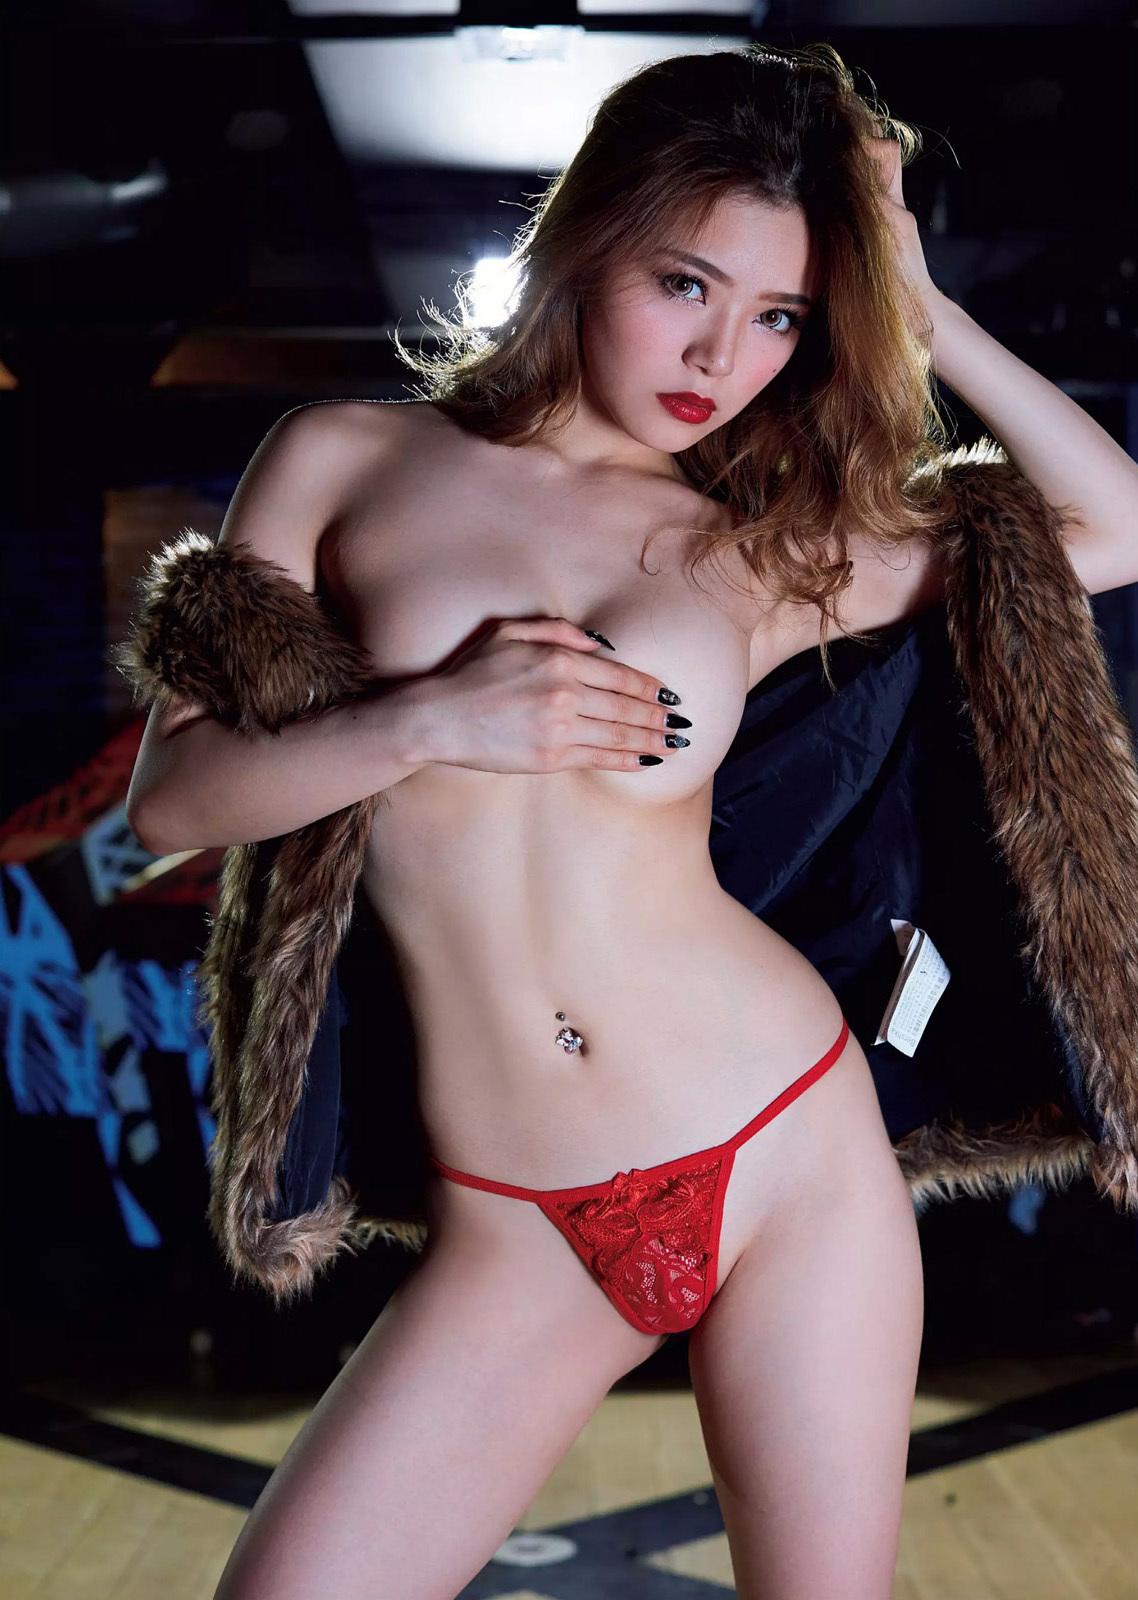 【GIFあり】人気ショークラブ「バーレスク東京」の露出ダンサー画像集 71枚・37枚目